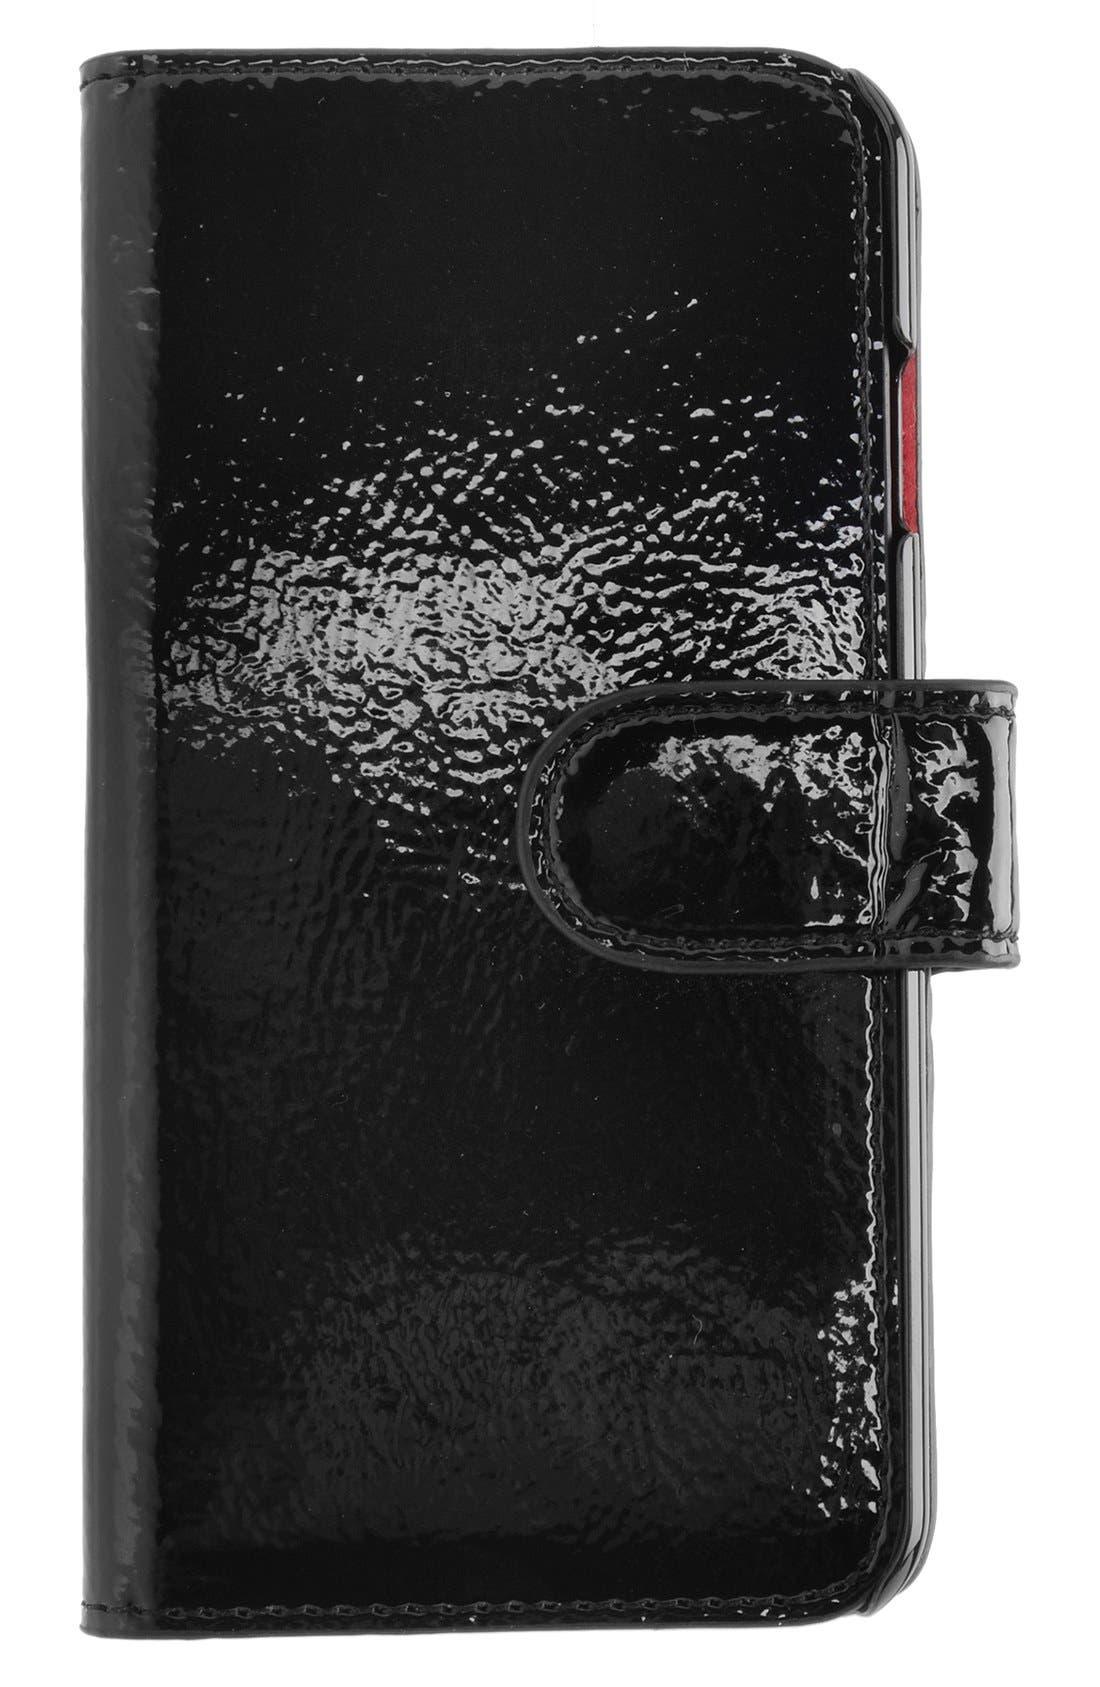 Main Image - Mobileluxe iPhone 6/6s Wallet Case